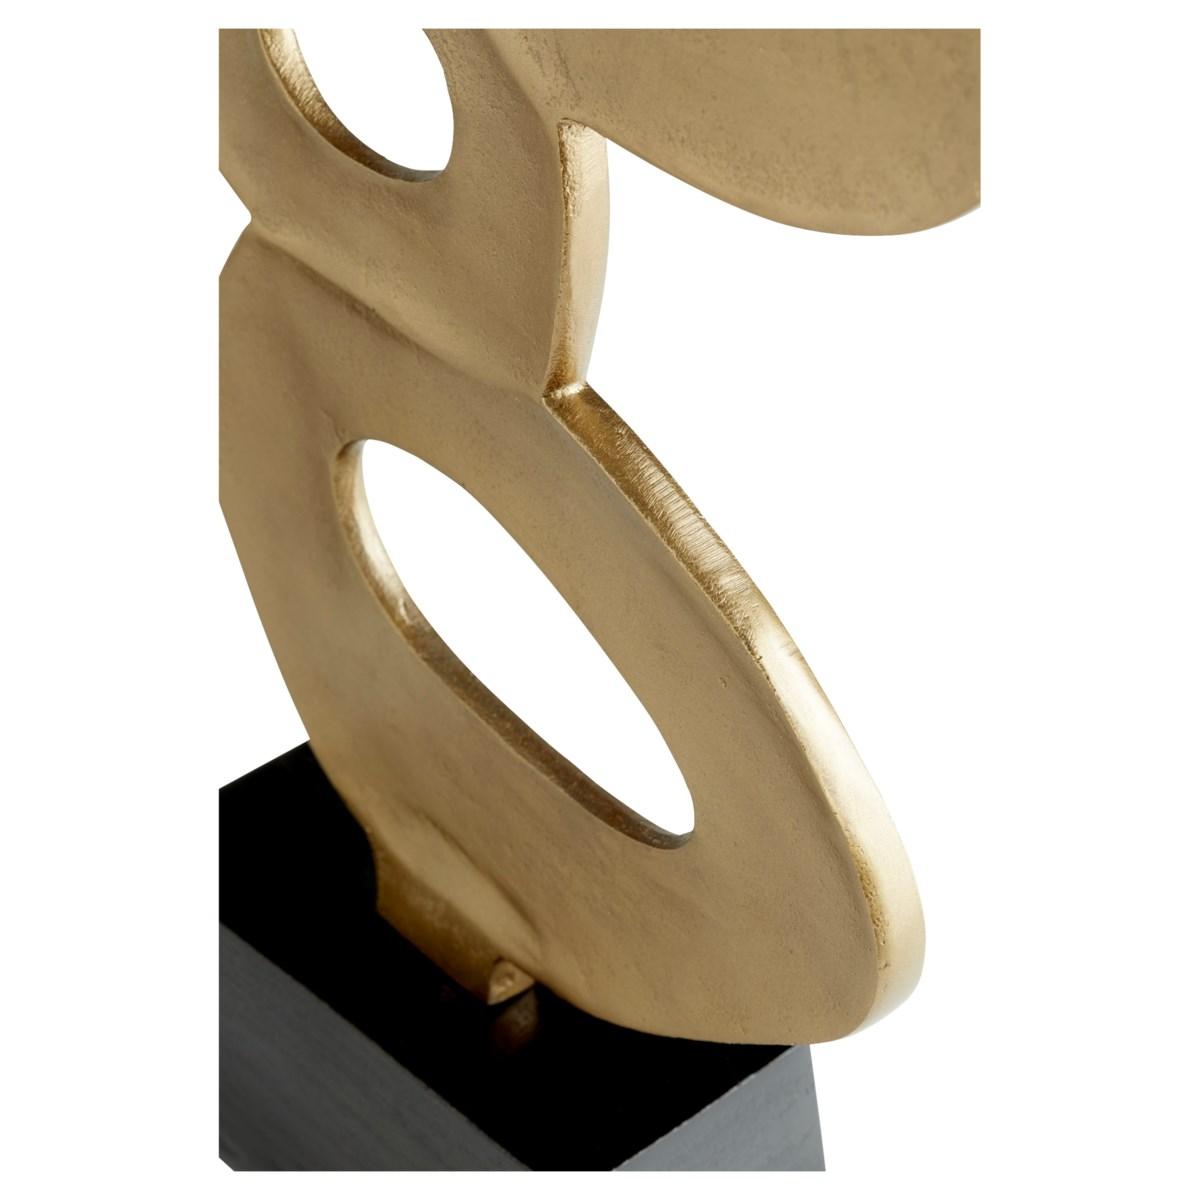 Chellean Lux #2 Sculpture